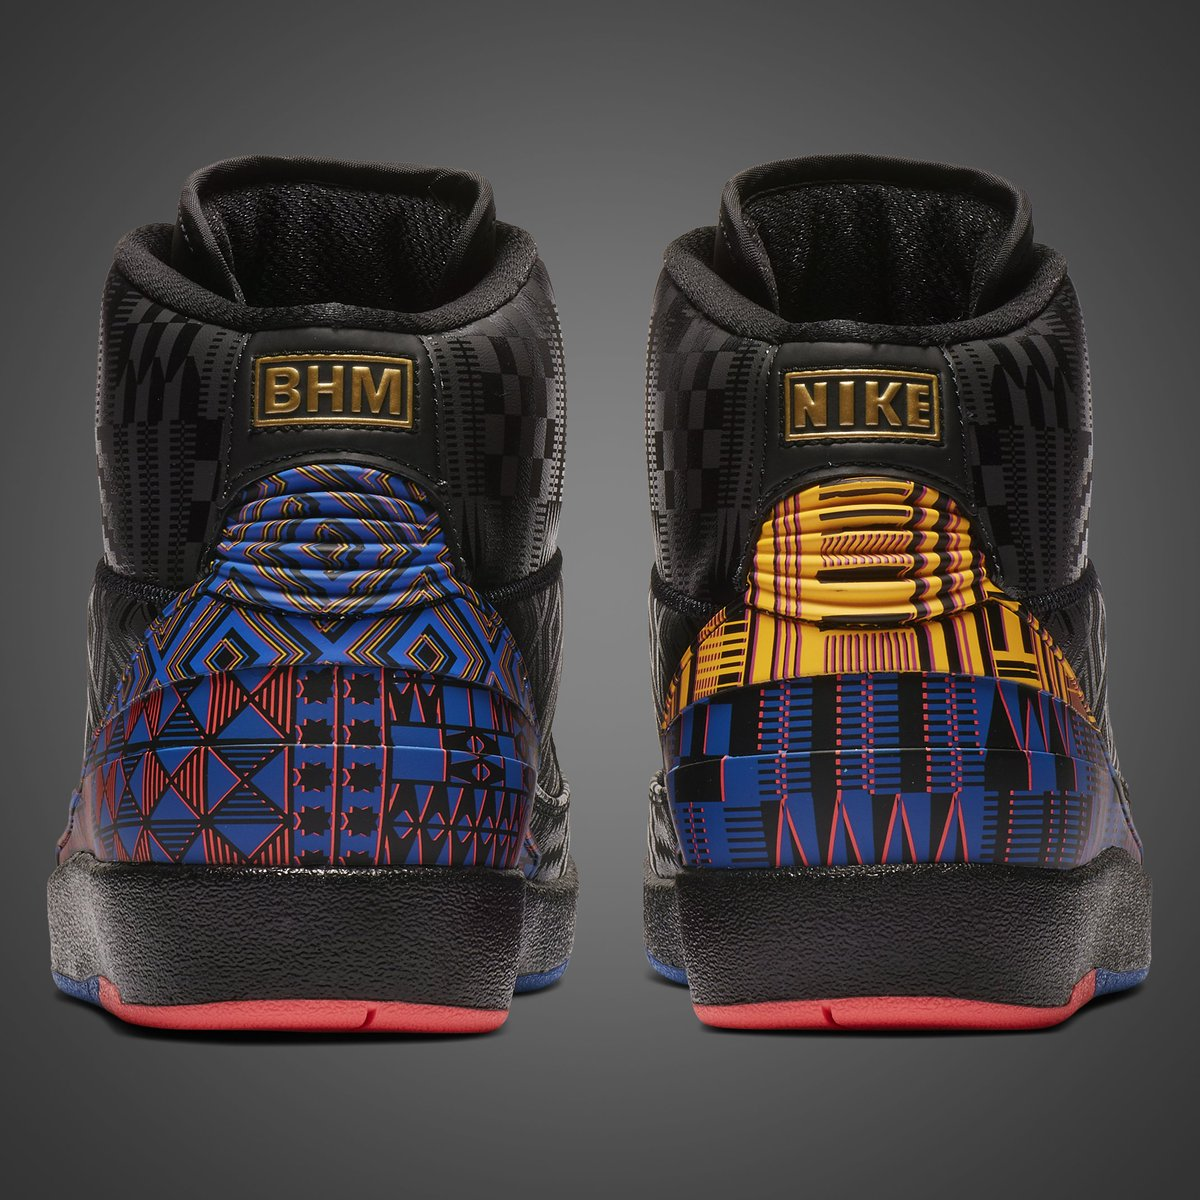 67c323e1e05d5 GB S Sneaker Shop on Twitter